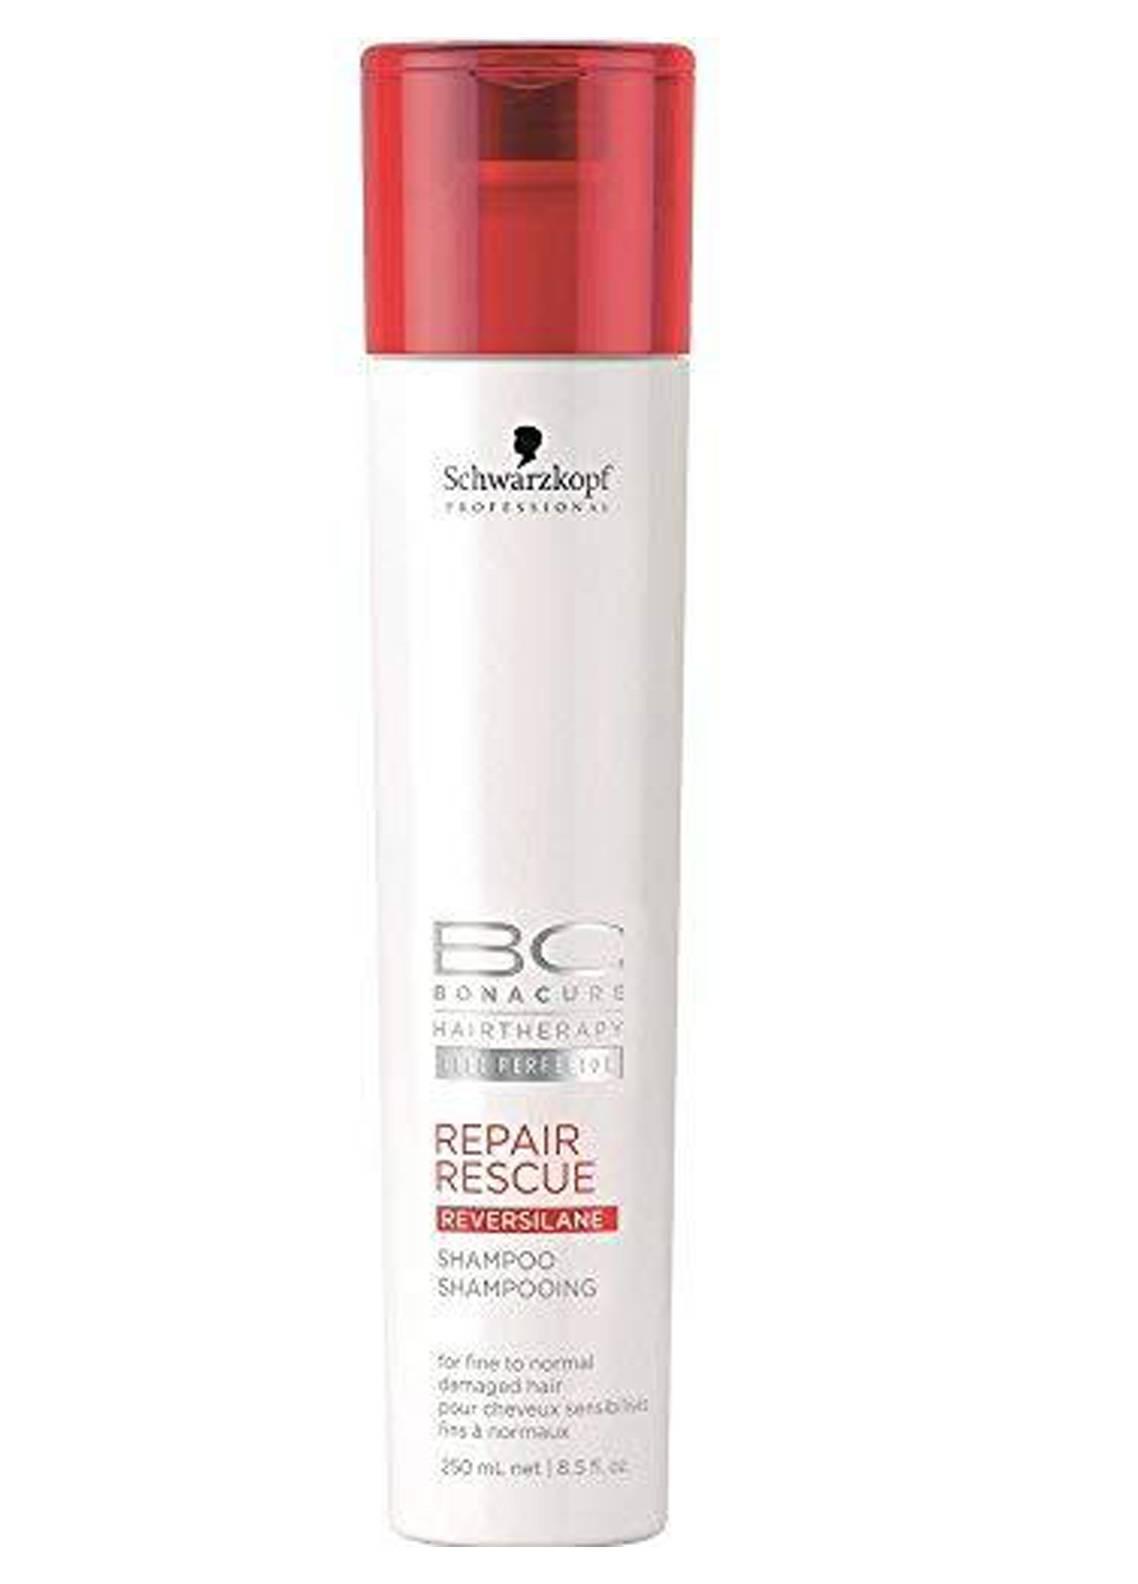 Schwarzkopf BC Repair Rescue Shampoo - 250 ml